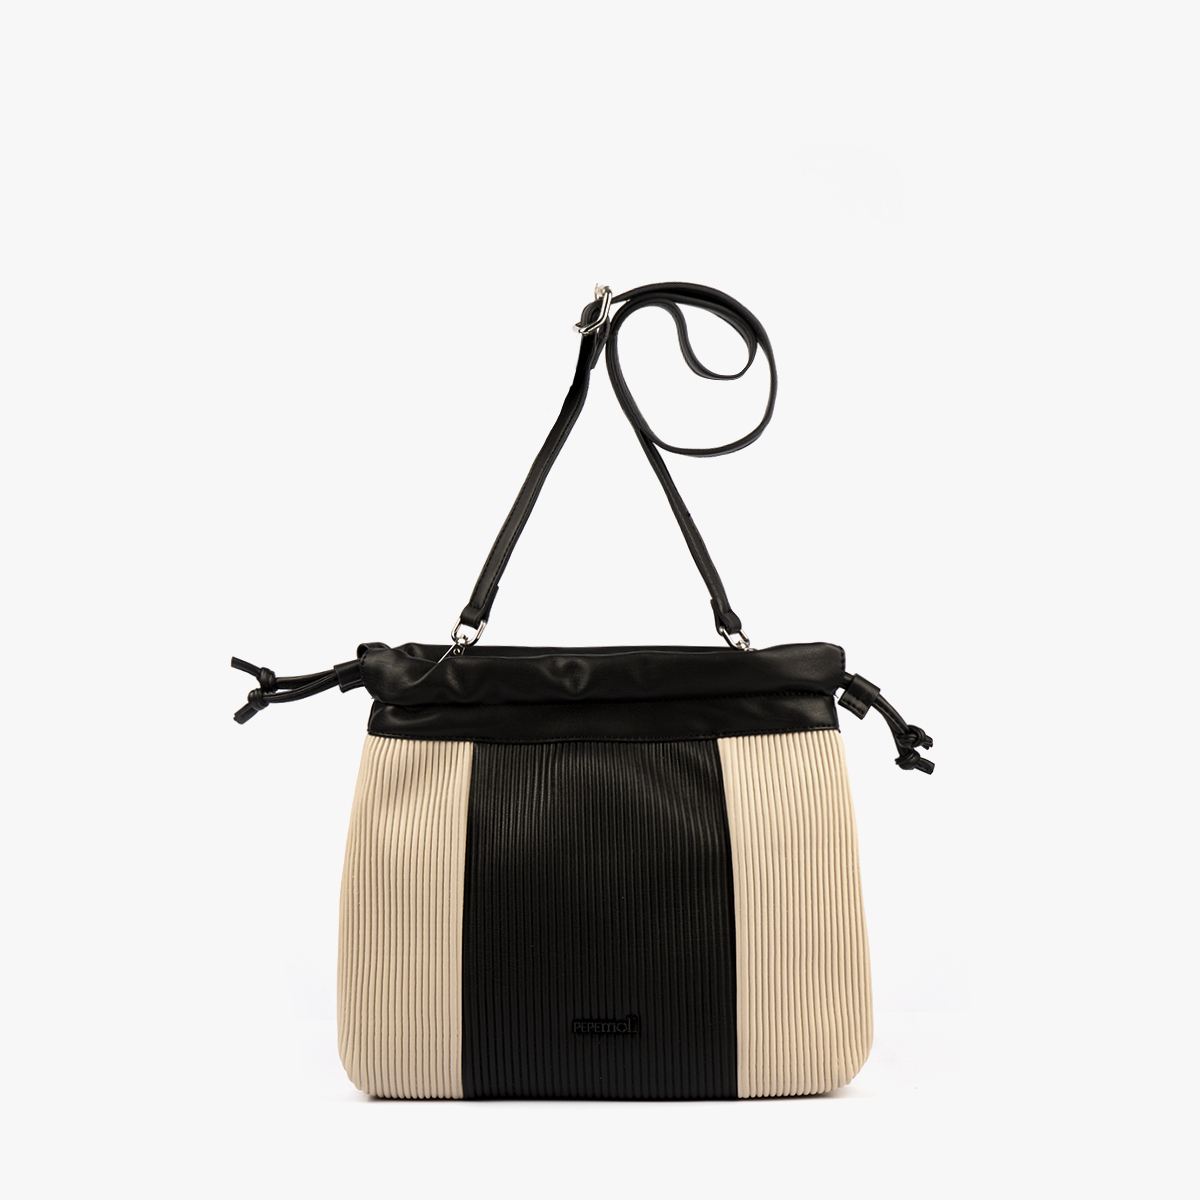 44121 bolso bandolera negro/beige pepemoll